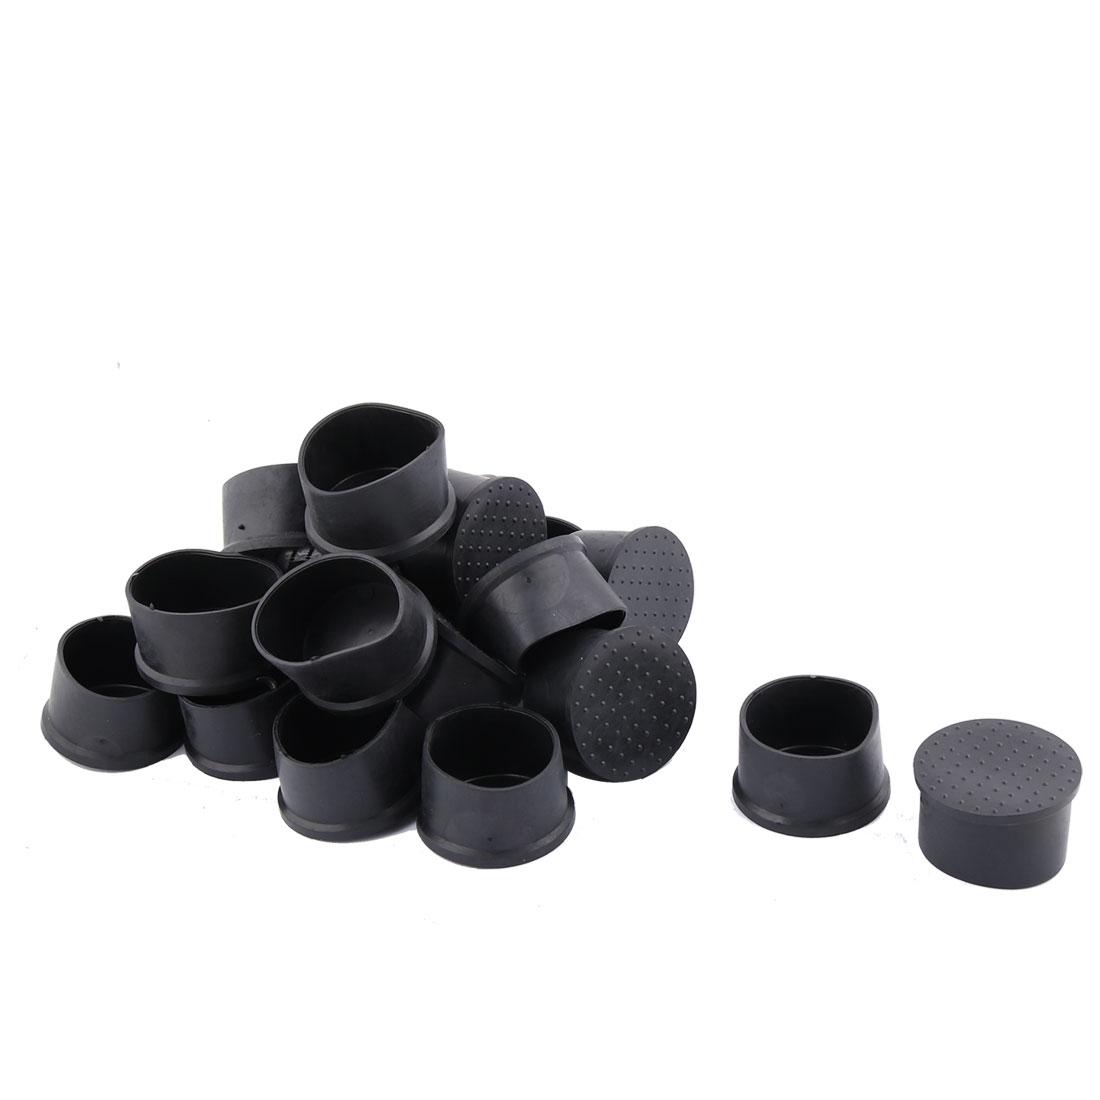 Home Furniture PVC Round Design Table Desk Tube Insert Cap Cover Black 20pcs